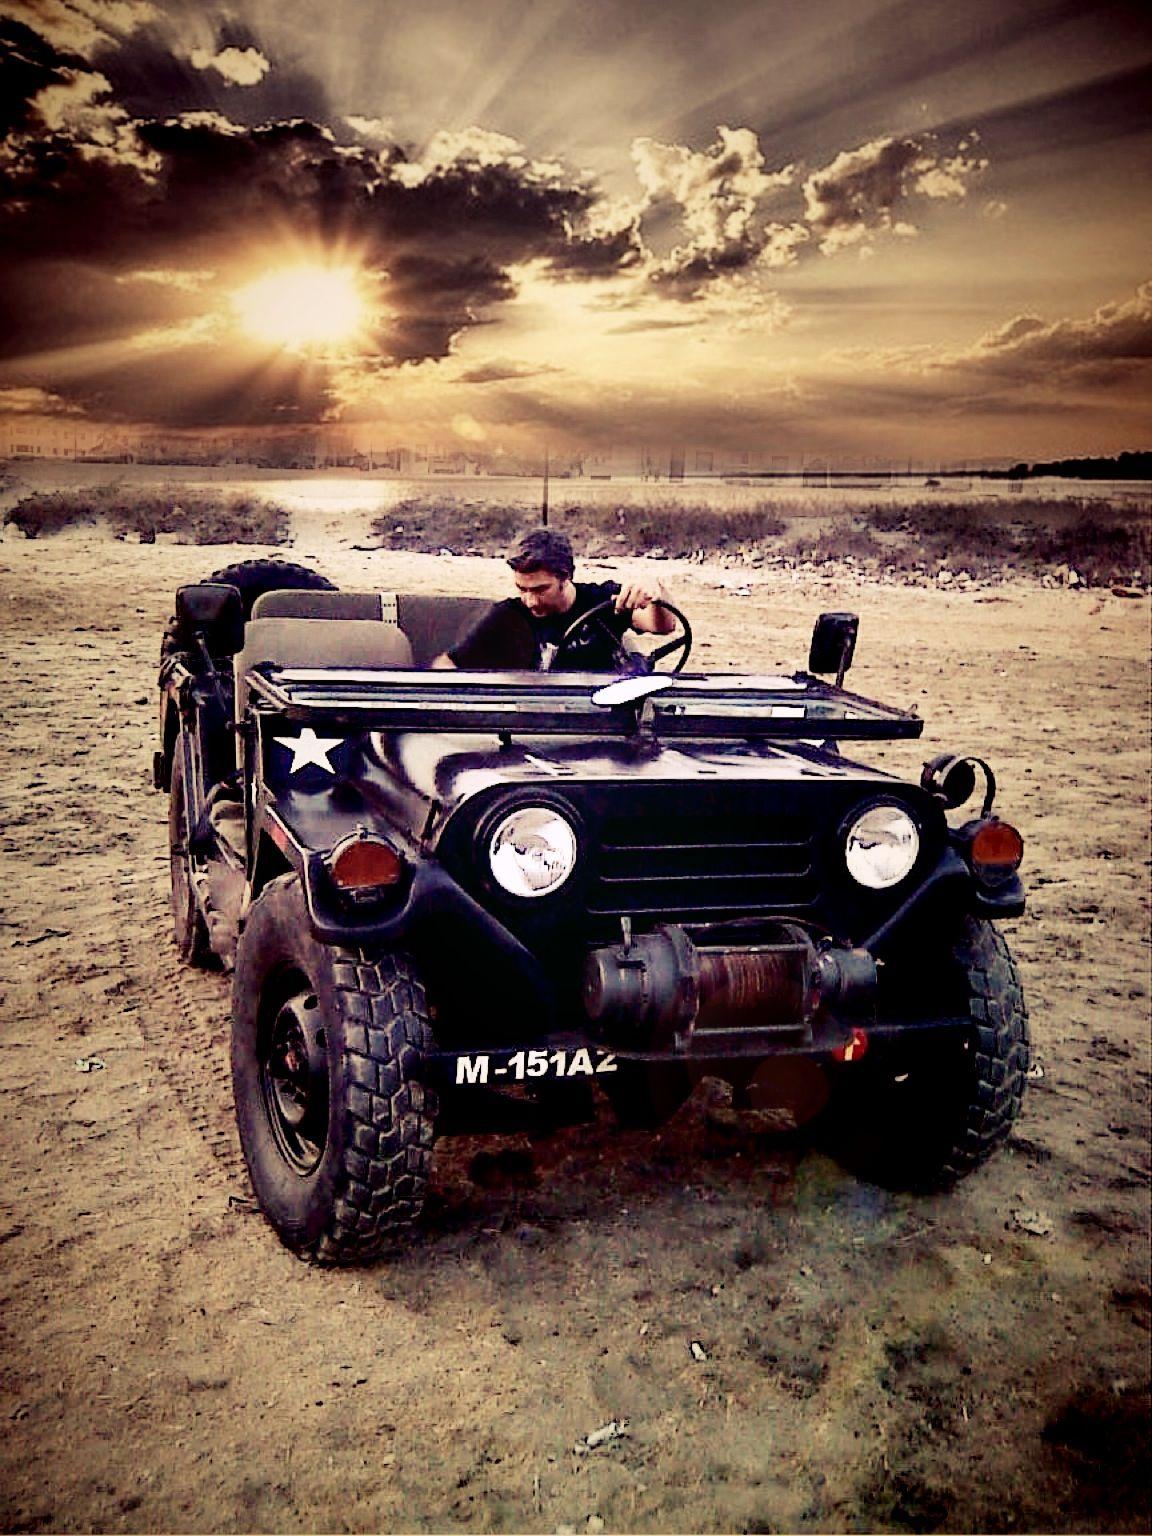 Willys Jeep ジープ Cj ジープ 自動車